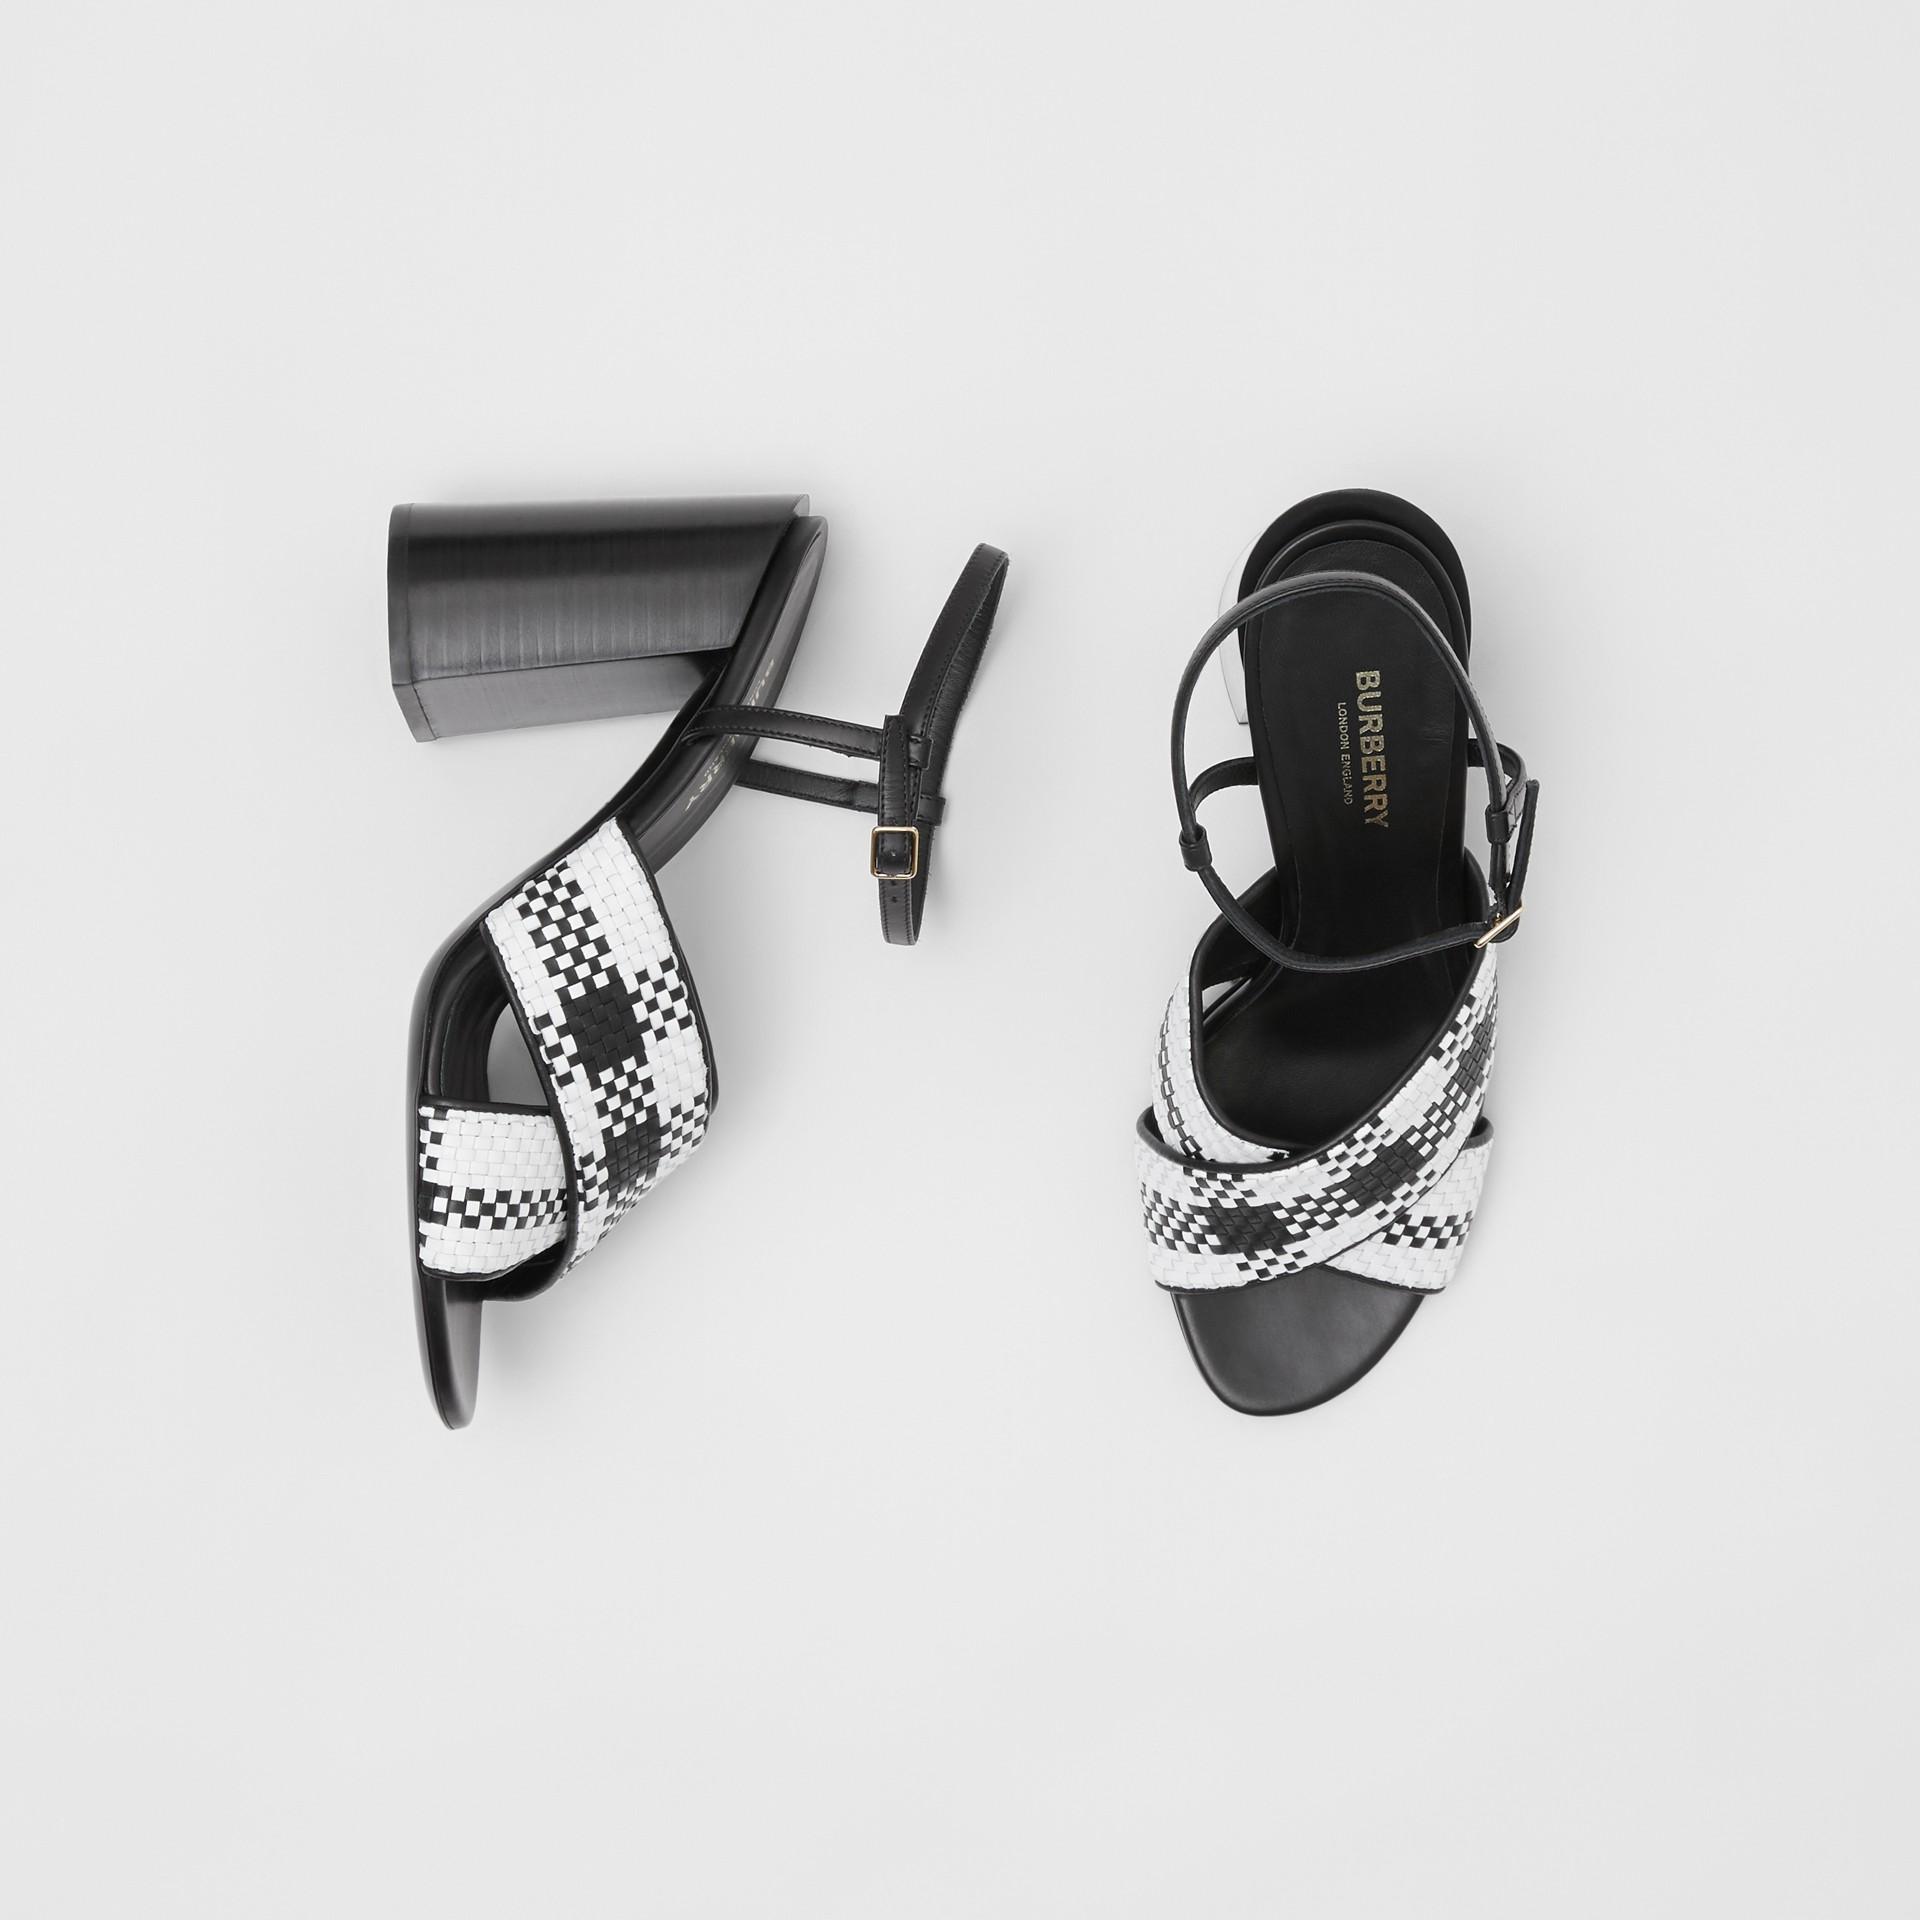 Latticed Leather Block-heel Sandals in Black/white - Women | Burberry - gallery image 0